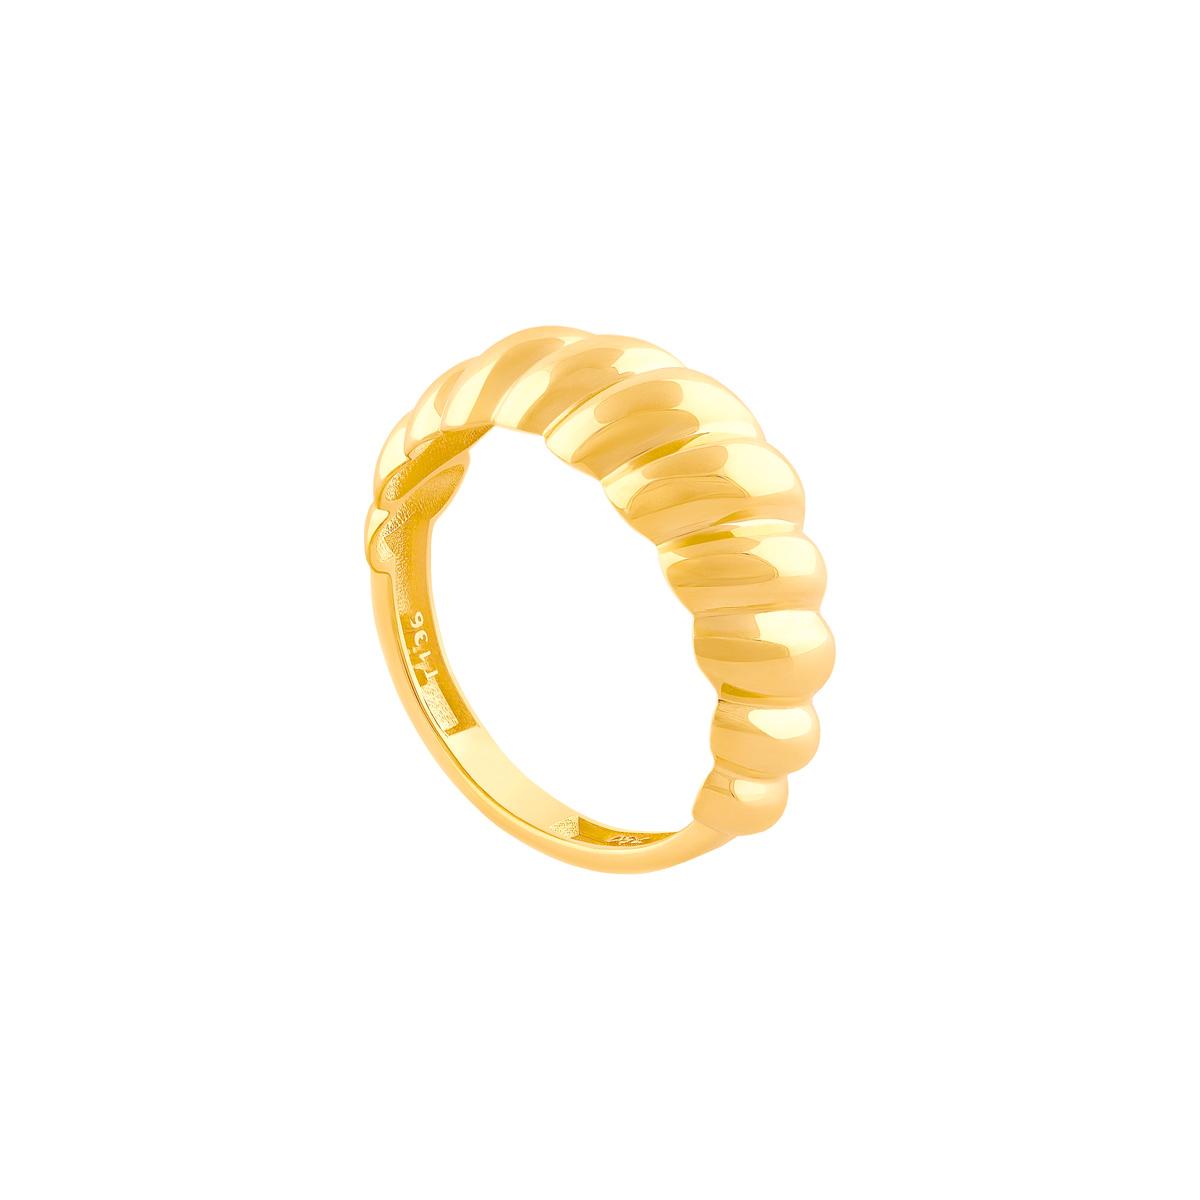 انگشتر طلا دامله صدفی